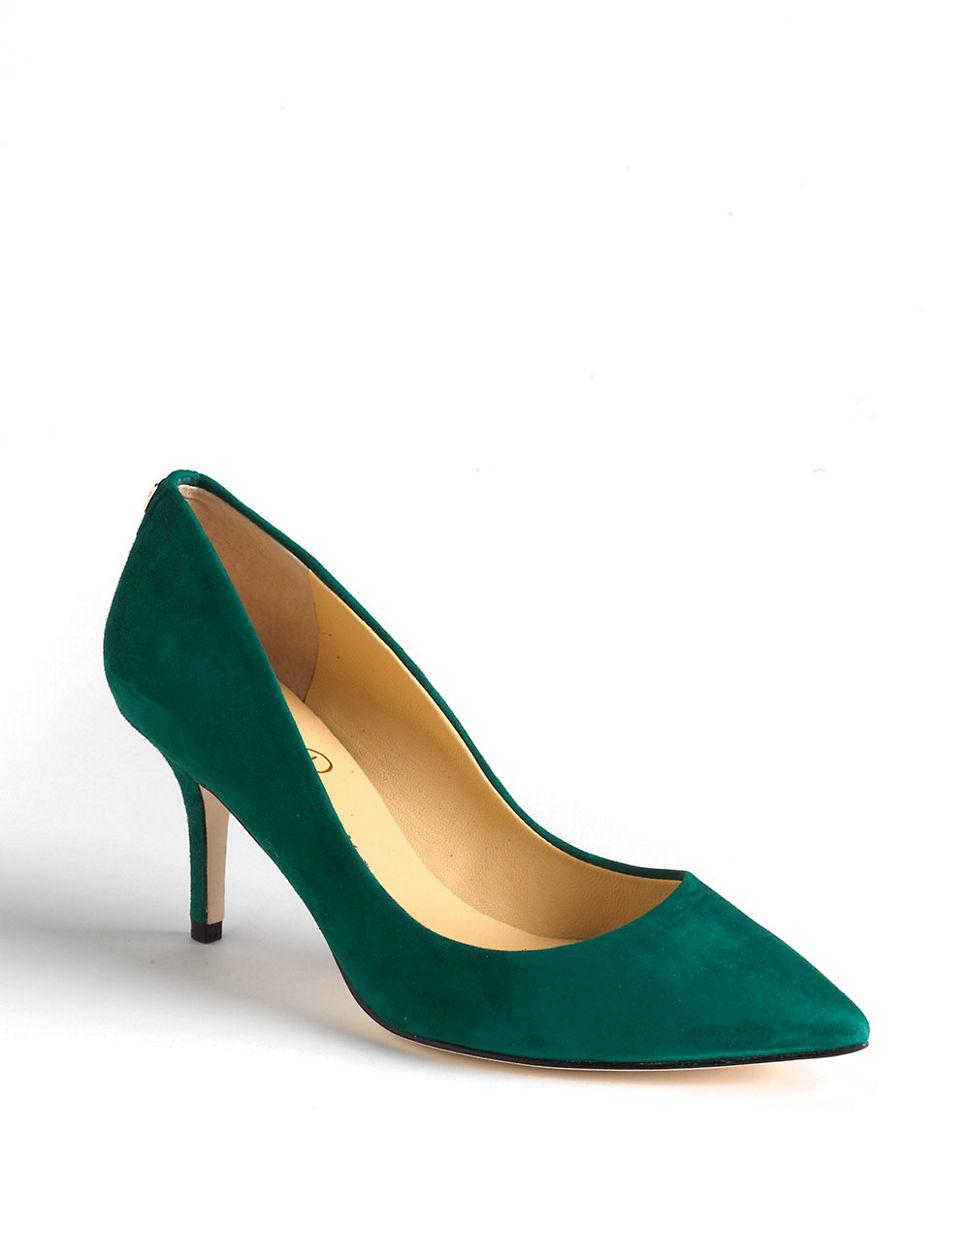 Ivanka trump Natalie S... Ivanka Trump Shoes Nordstrom